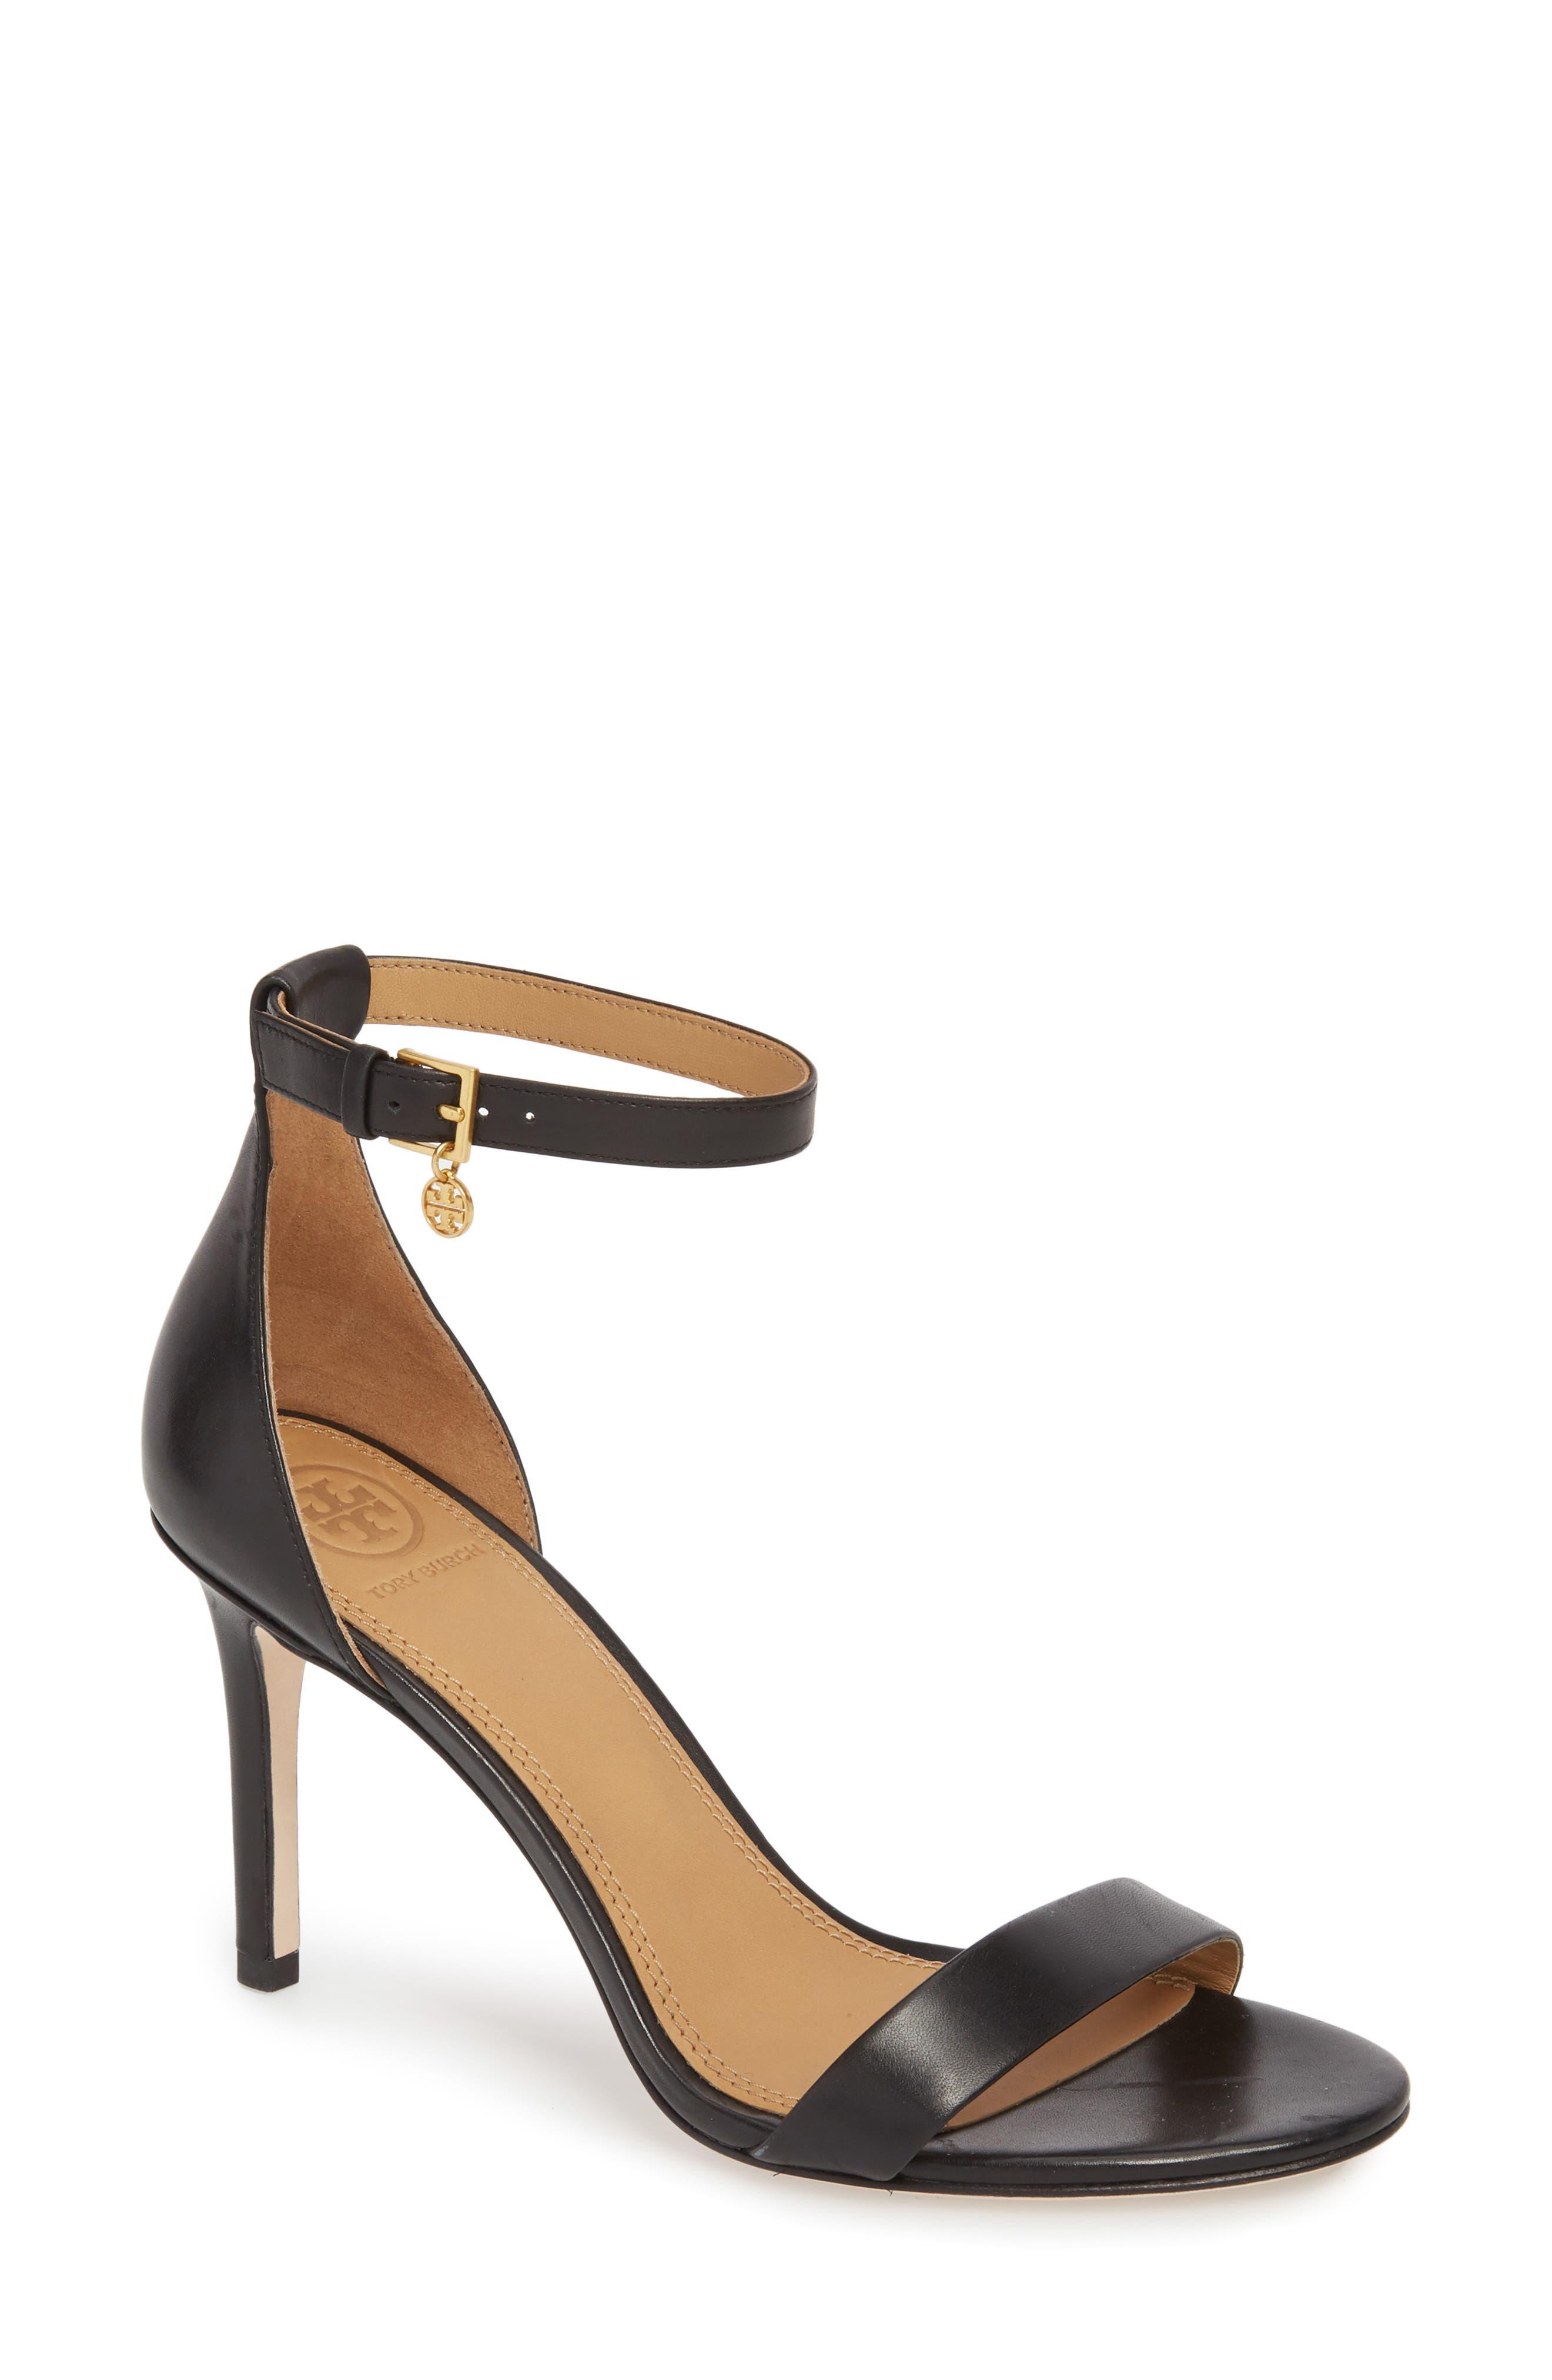 Tory Burch Ellie Ankle Strap Sandal- Black